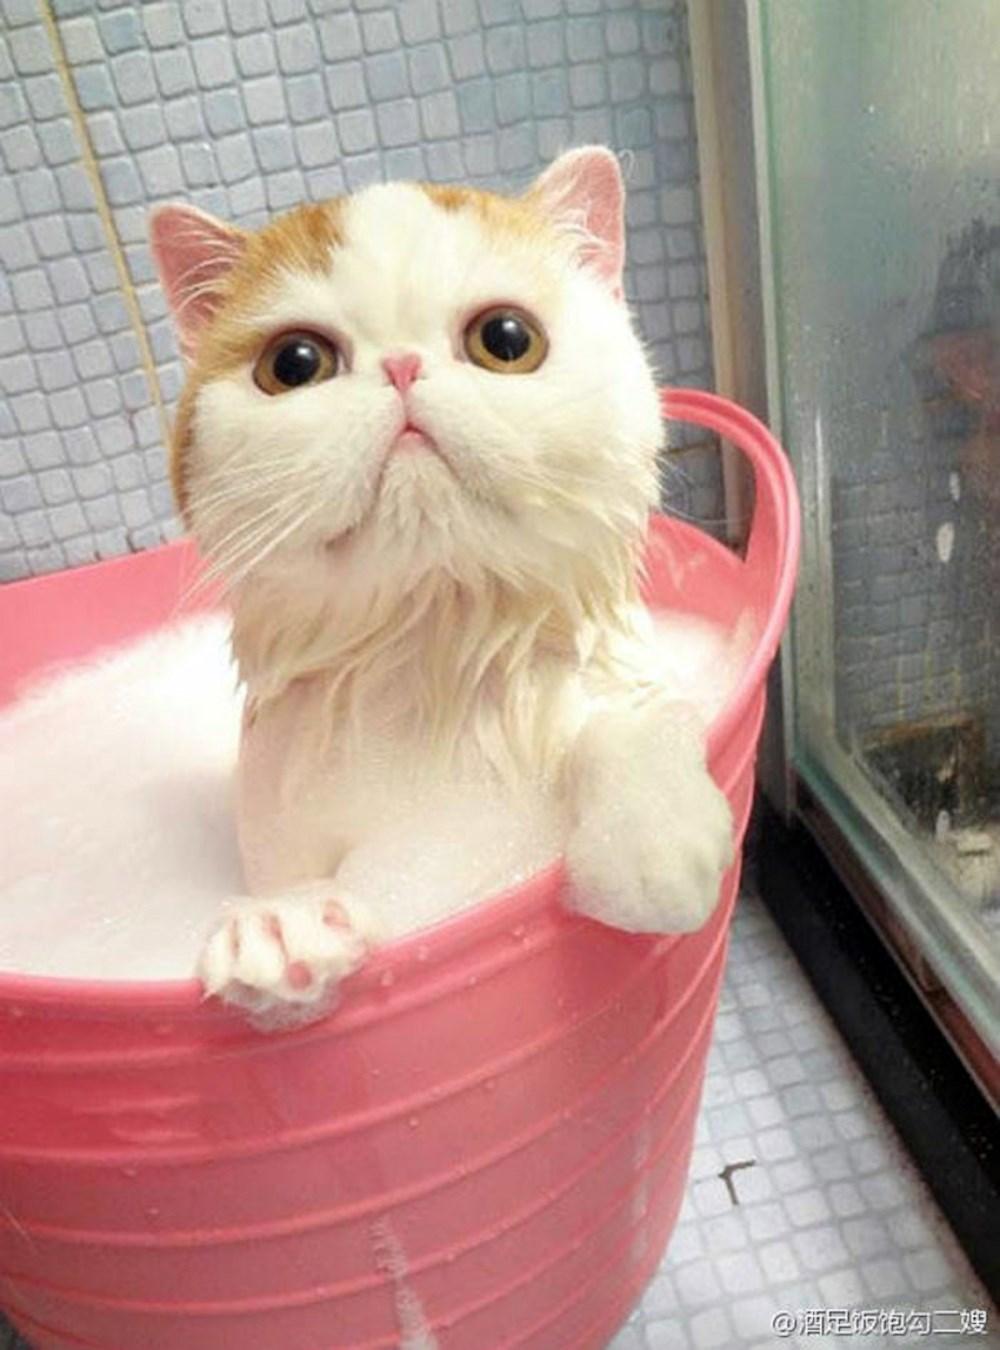 00 animals bath 10. 280715